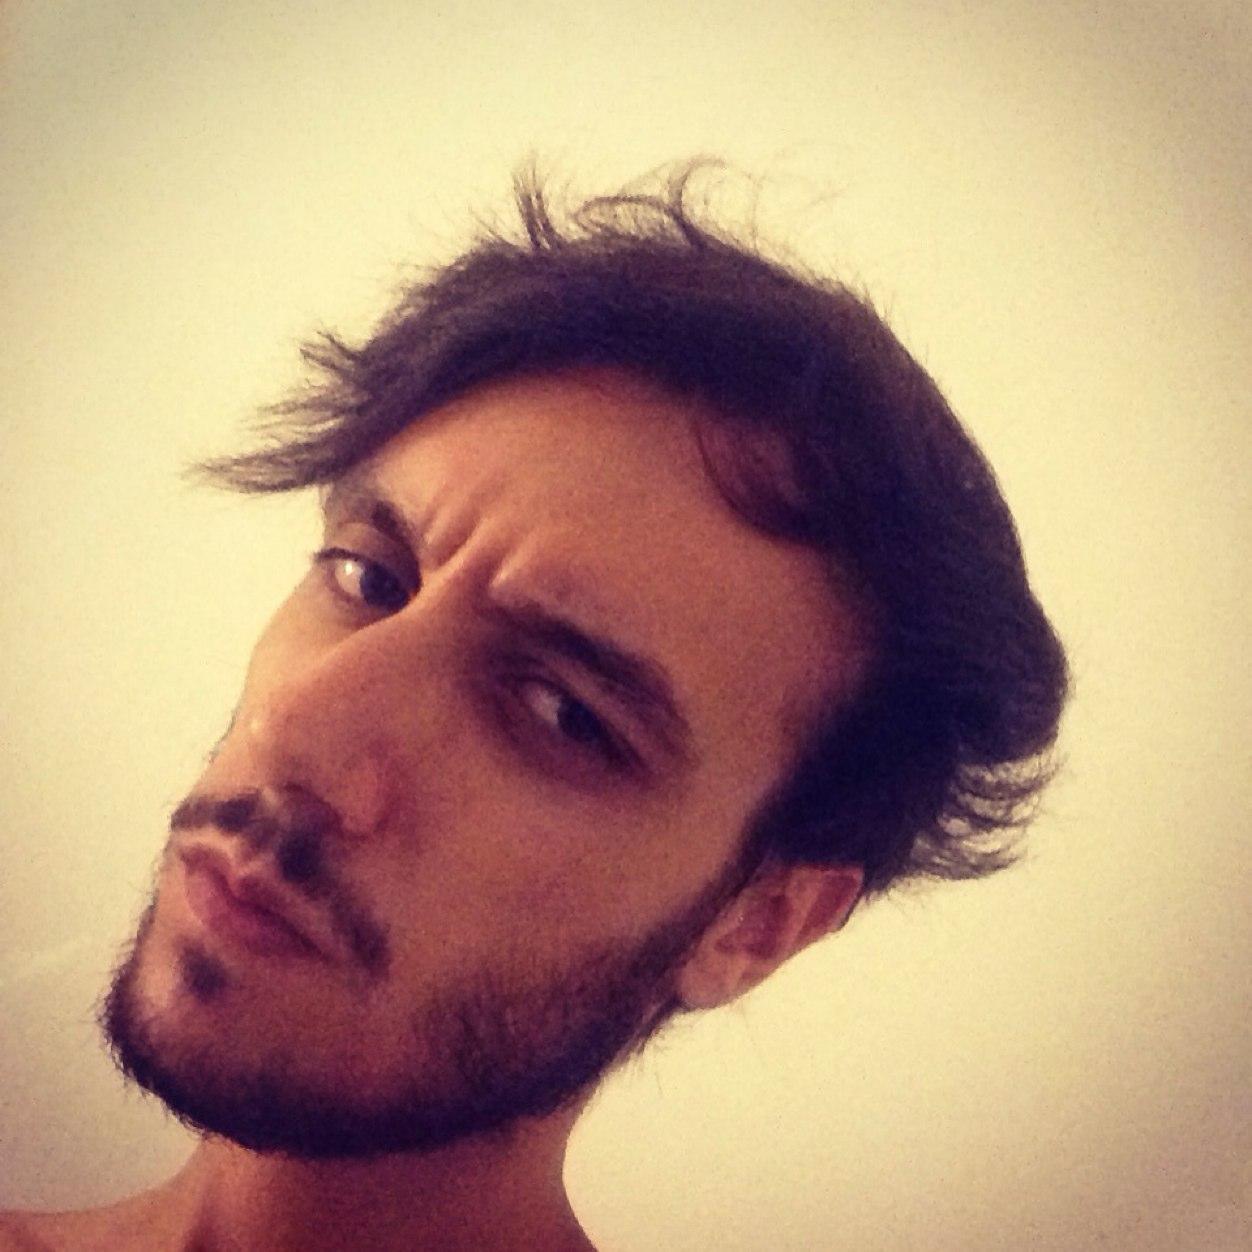 Francesco marchesi aboutmarchesi twitter for Francesco marchesi